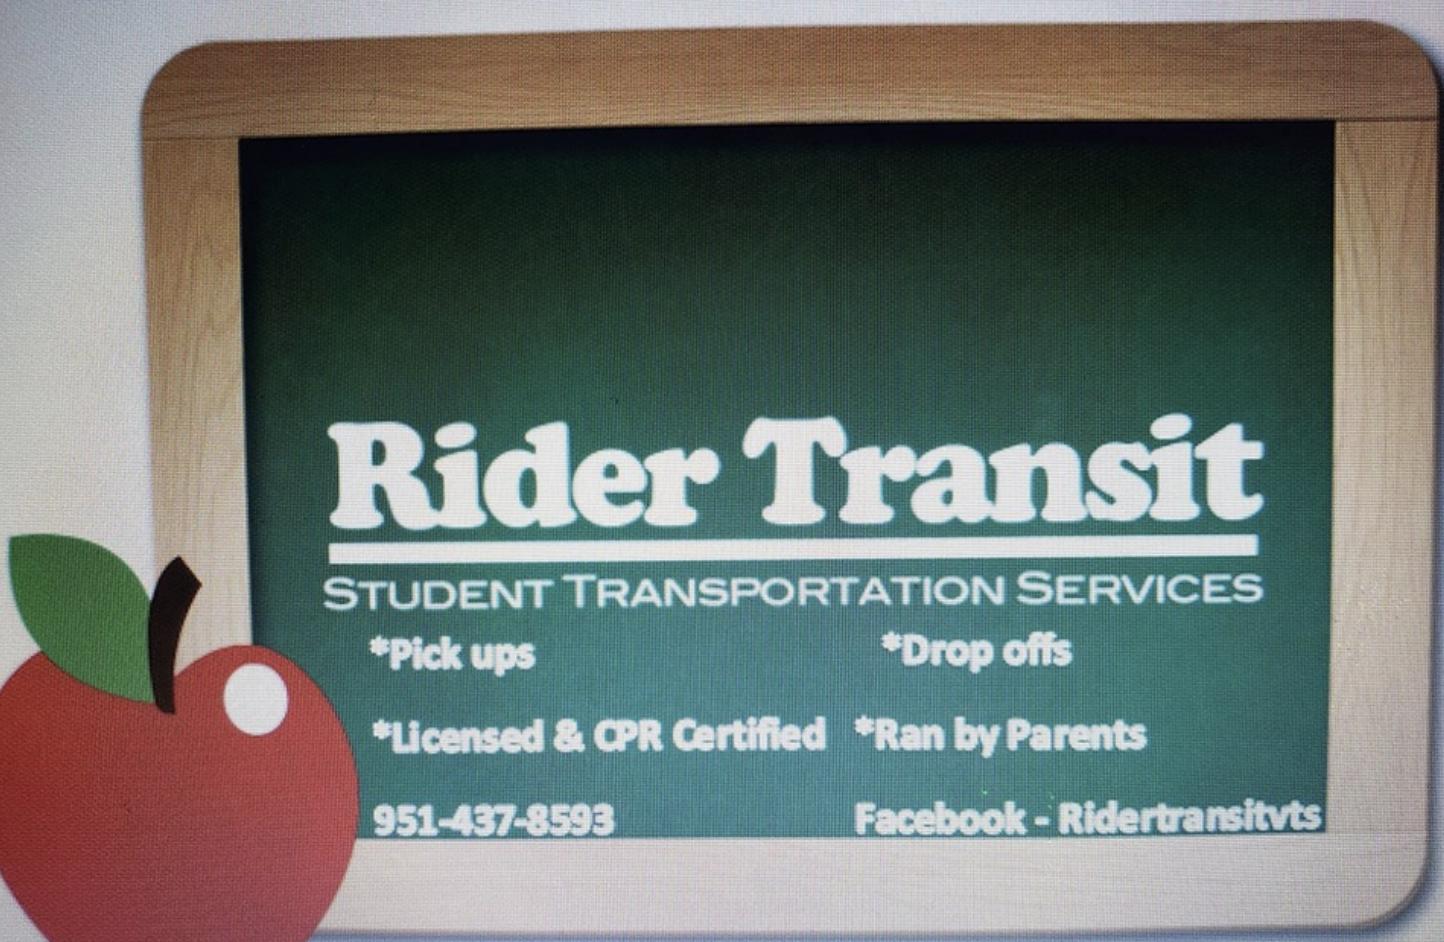 Rider Transit, transportation for children